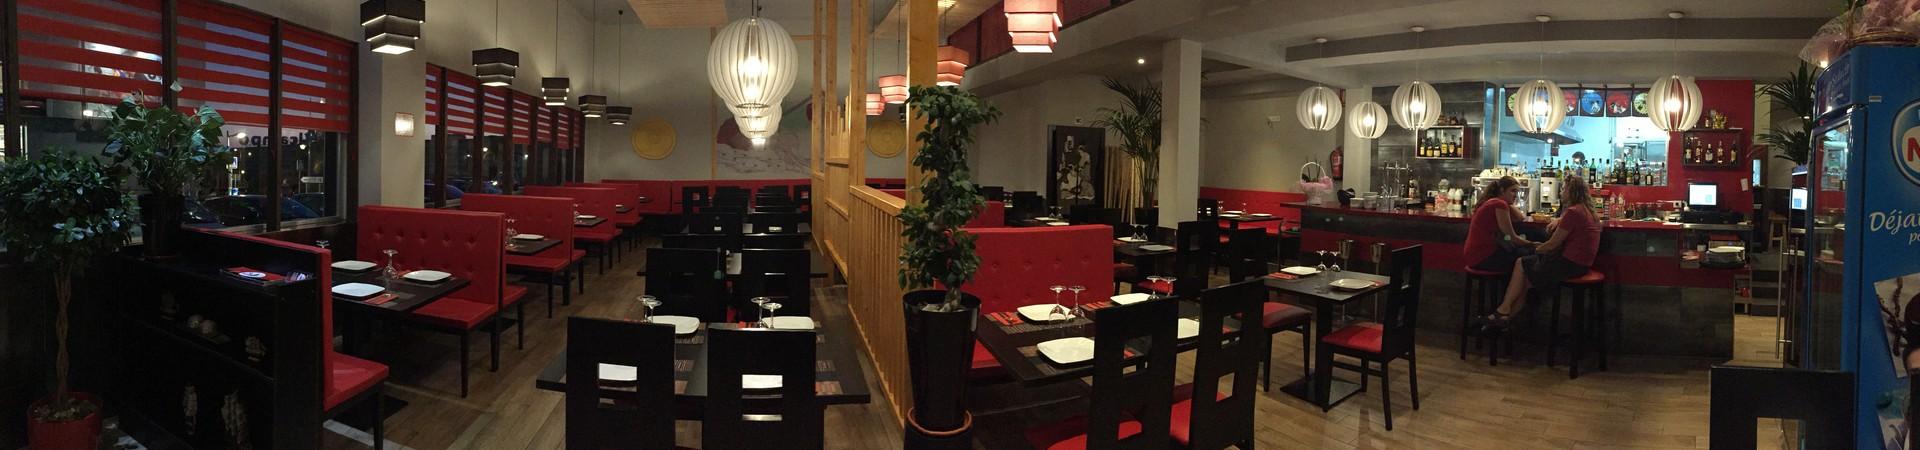 donde comer comida asiatica en motril, comida asiatica en motril, restaurante chino motril,